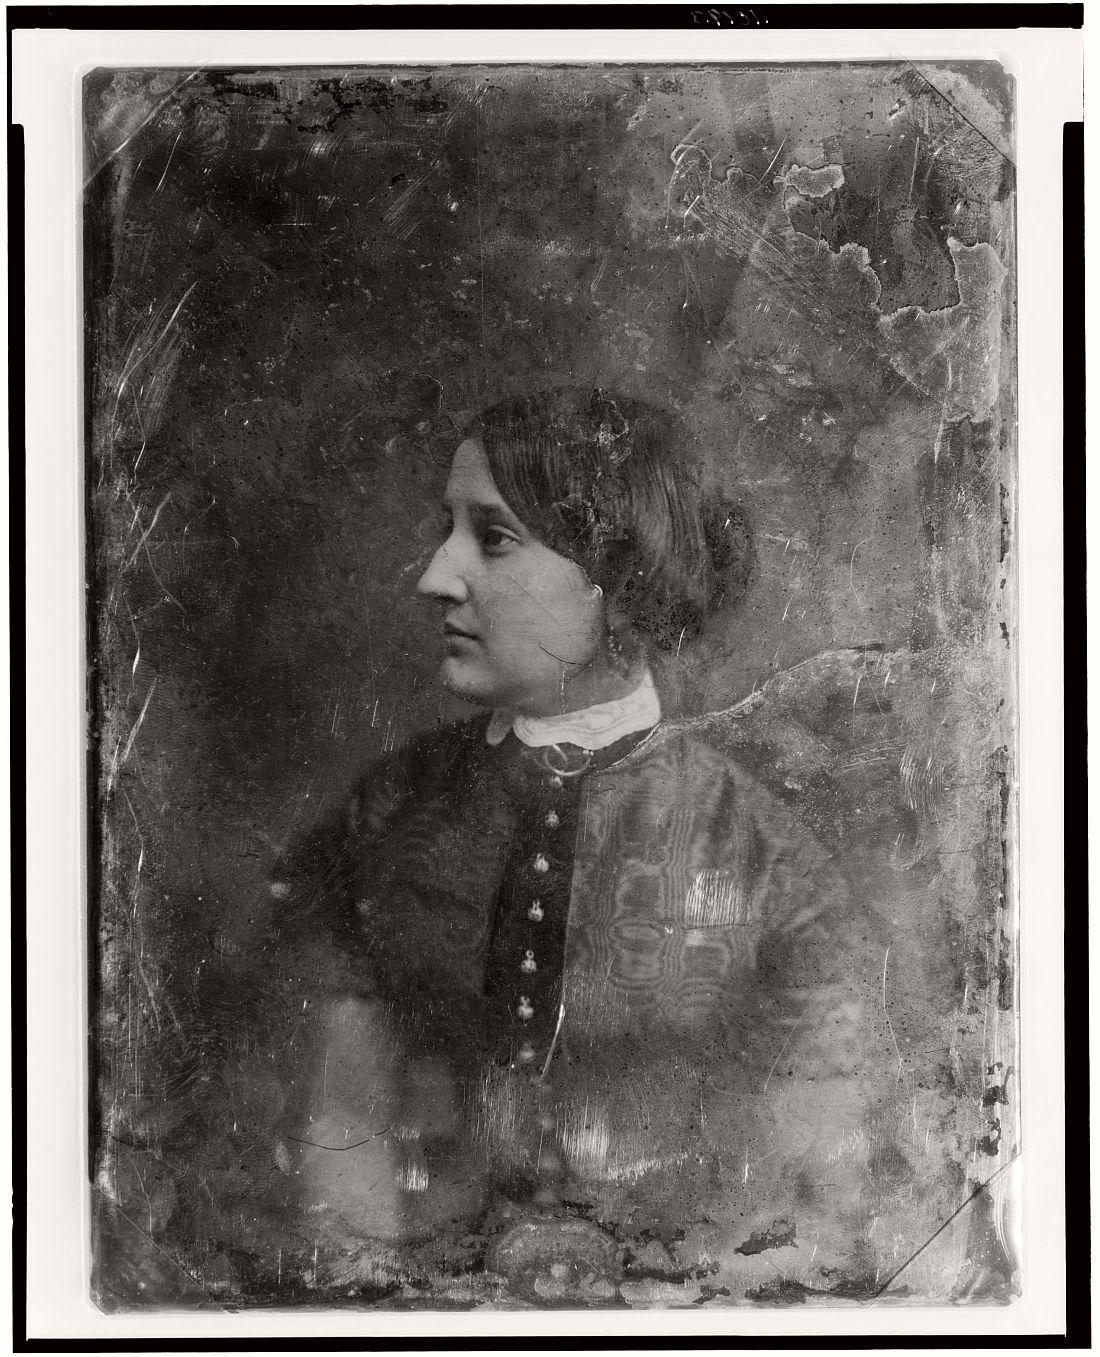 vintage-daguerreotype-portraits-from-xix-century-1844-1860-66